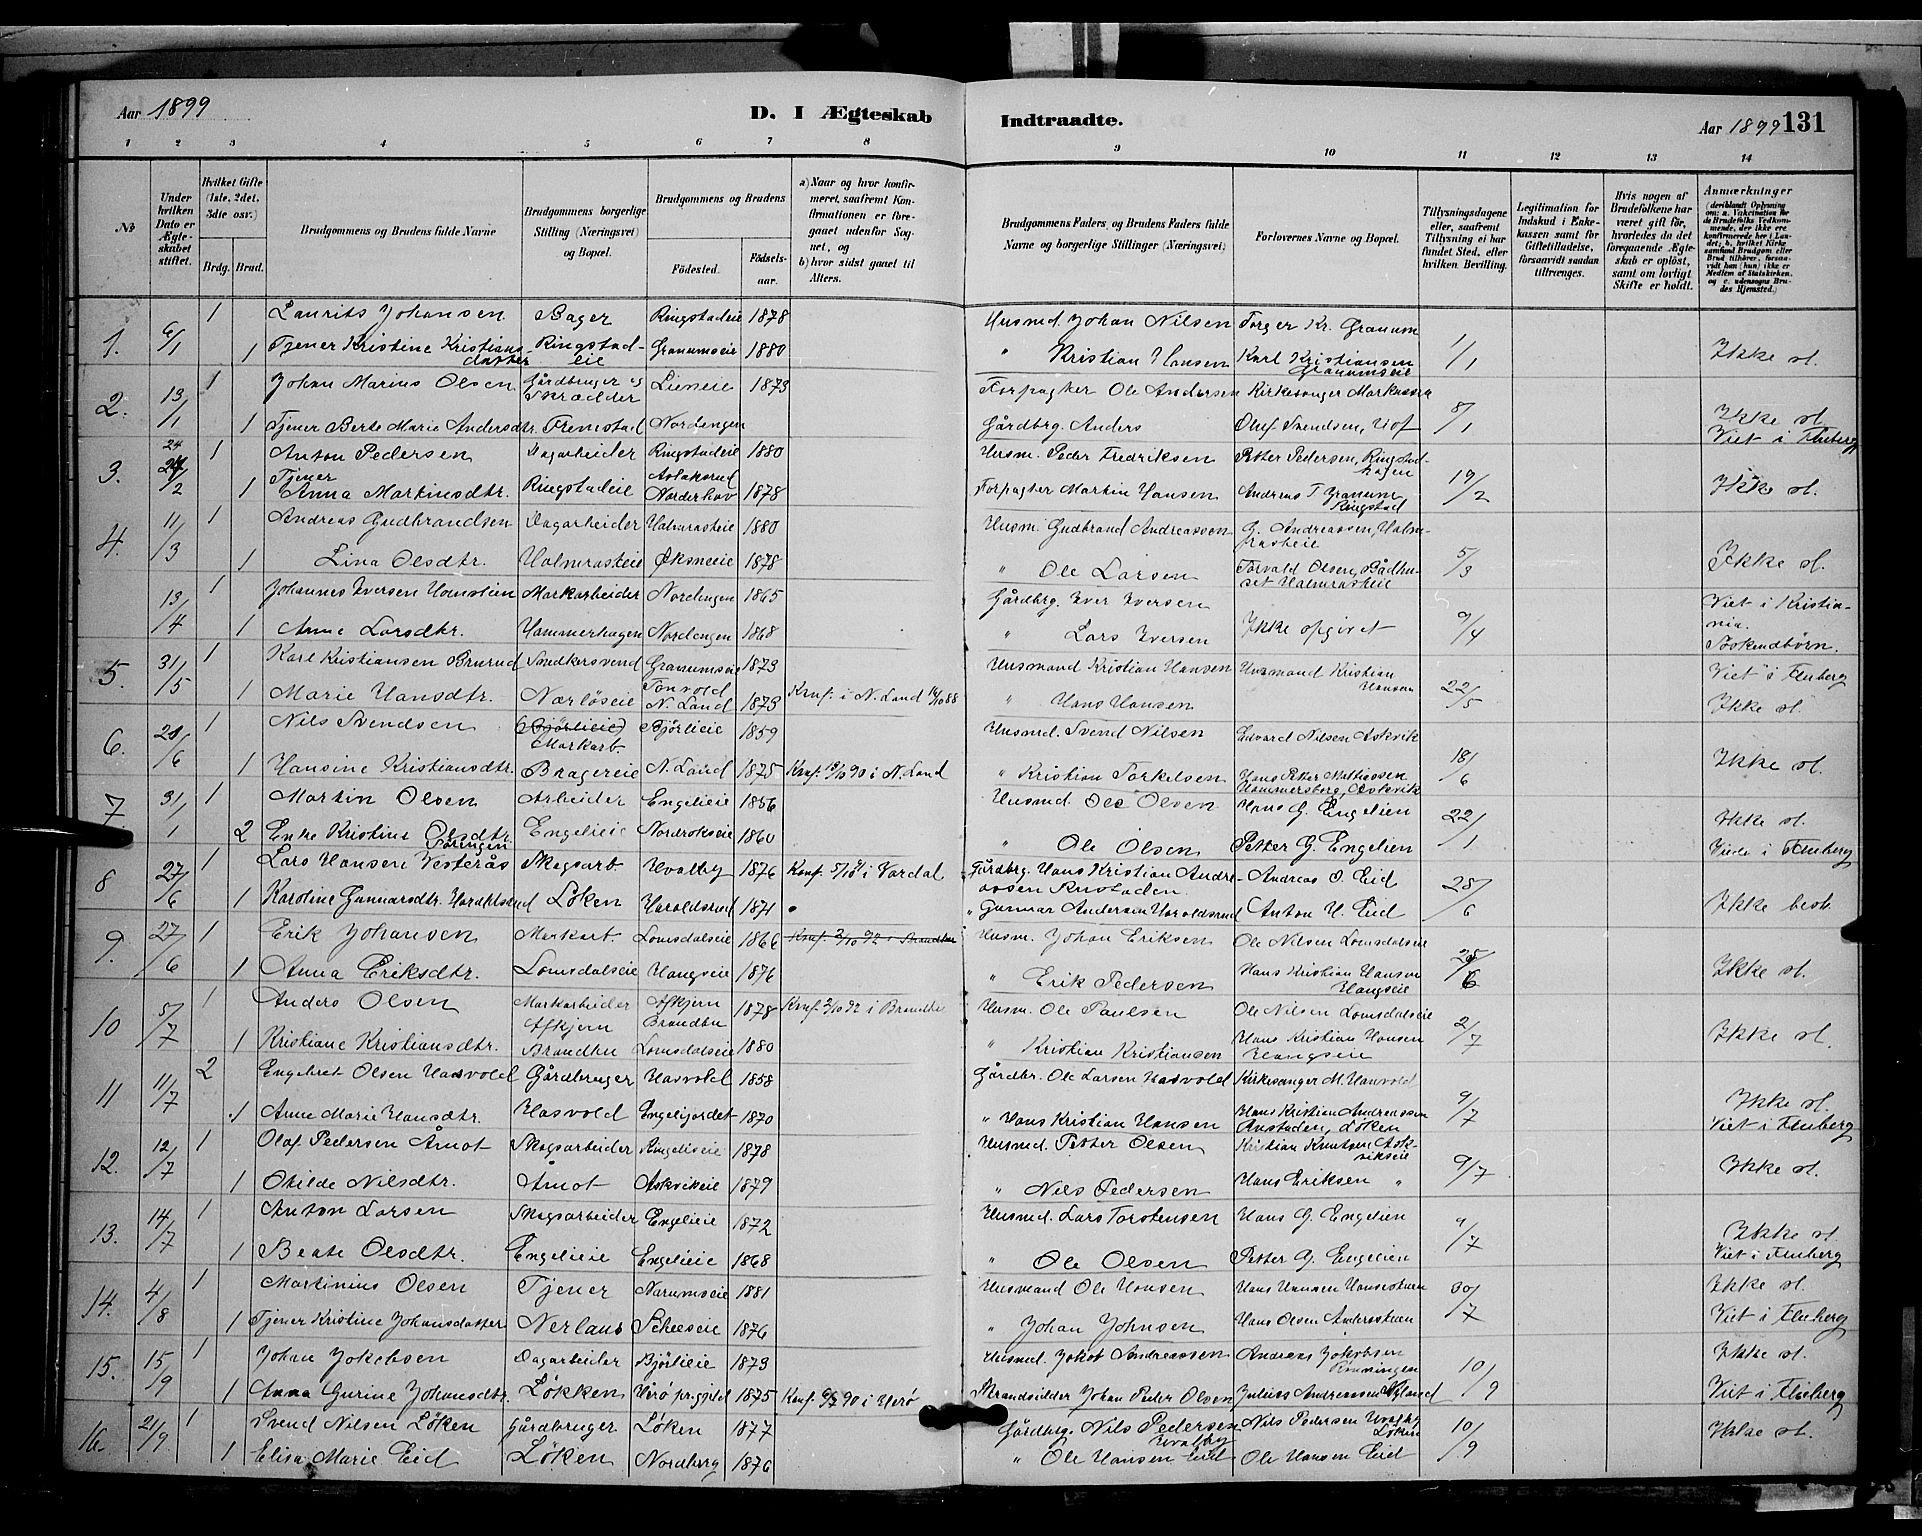 SAH, Søndre Land prestekontor, L/L0002: Klokkerbok nr. 2, 1884-1900, s. 131